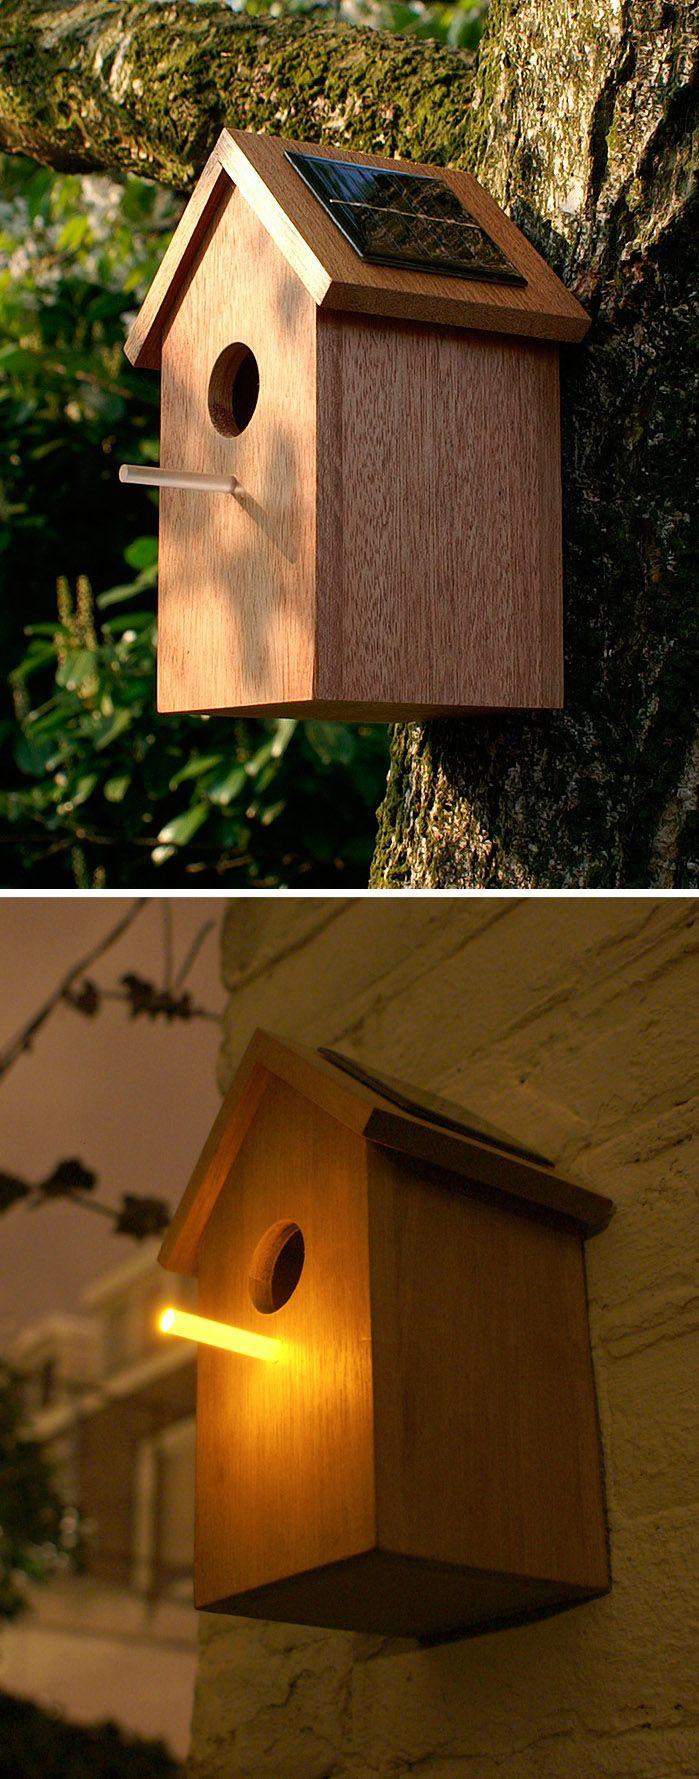 How To Keep Birds Away From Solar Panels In 2020 Solar Panels Wild Birds Solar